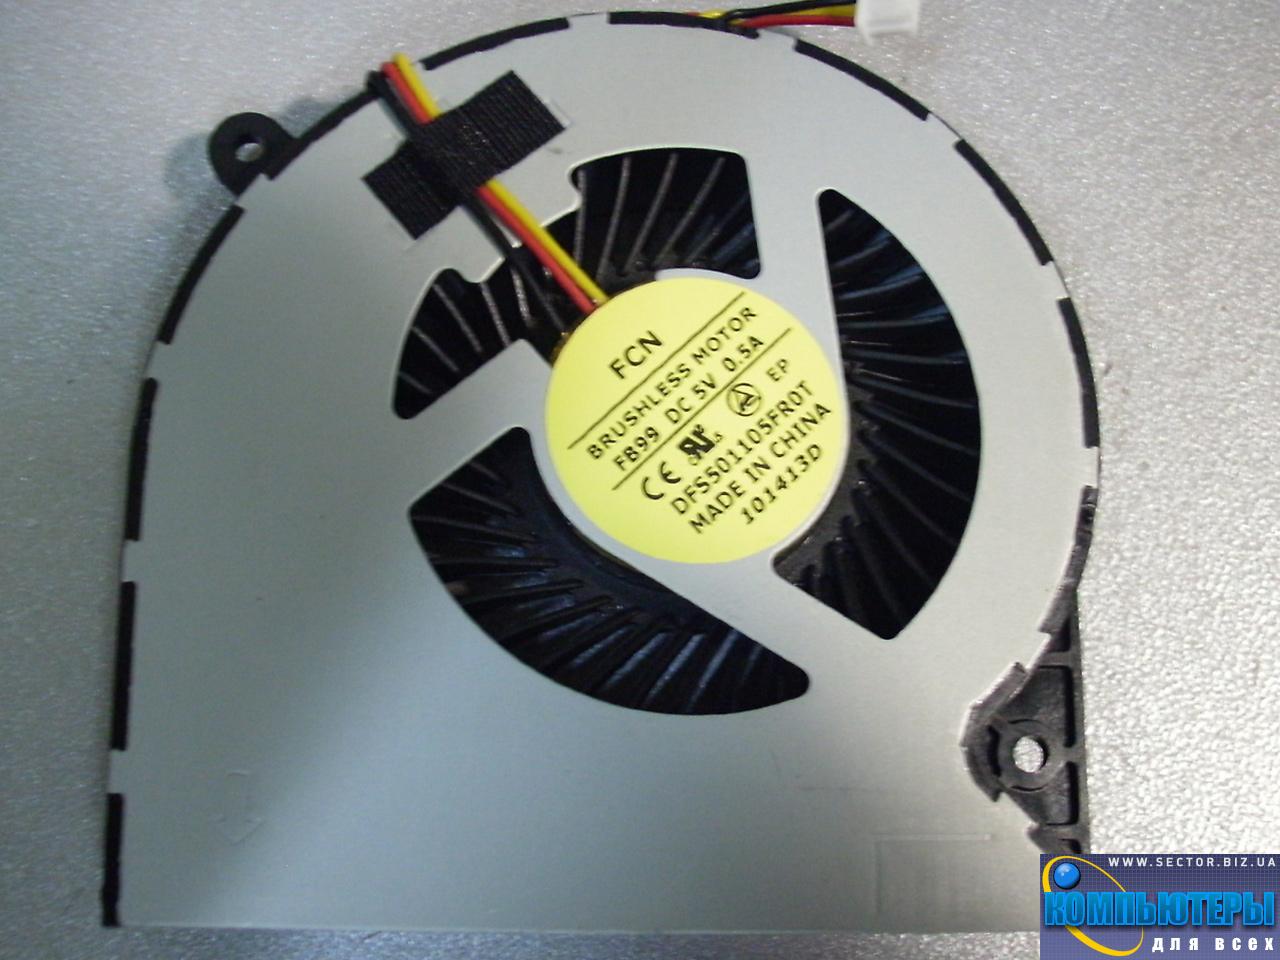 Кулер к ноутбуку Toshiba C850 C870 C855 C875 L850 p/n: DFS501105FR0T FB99 101413D. Фото № 4.